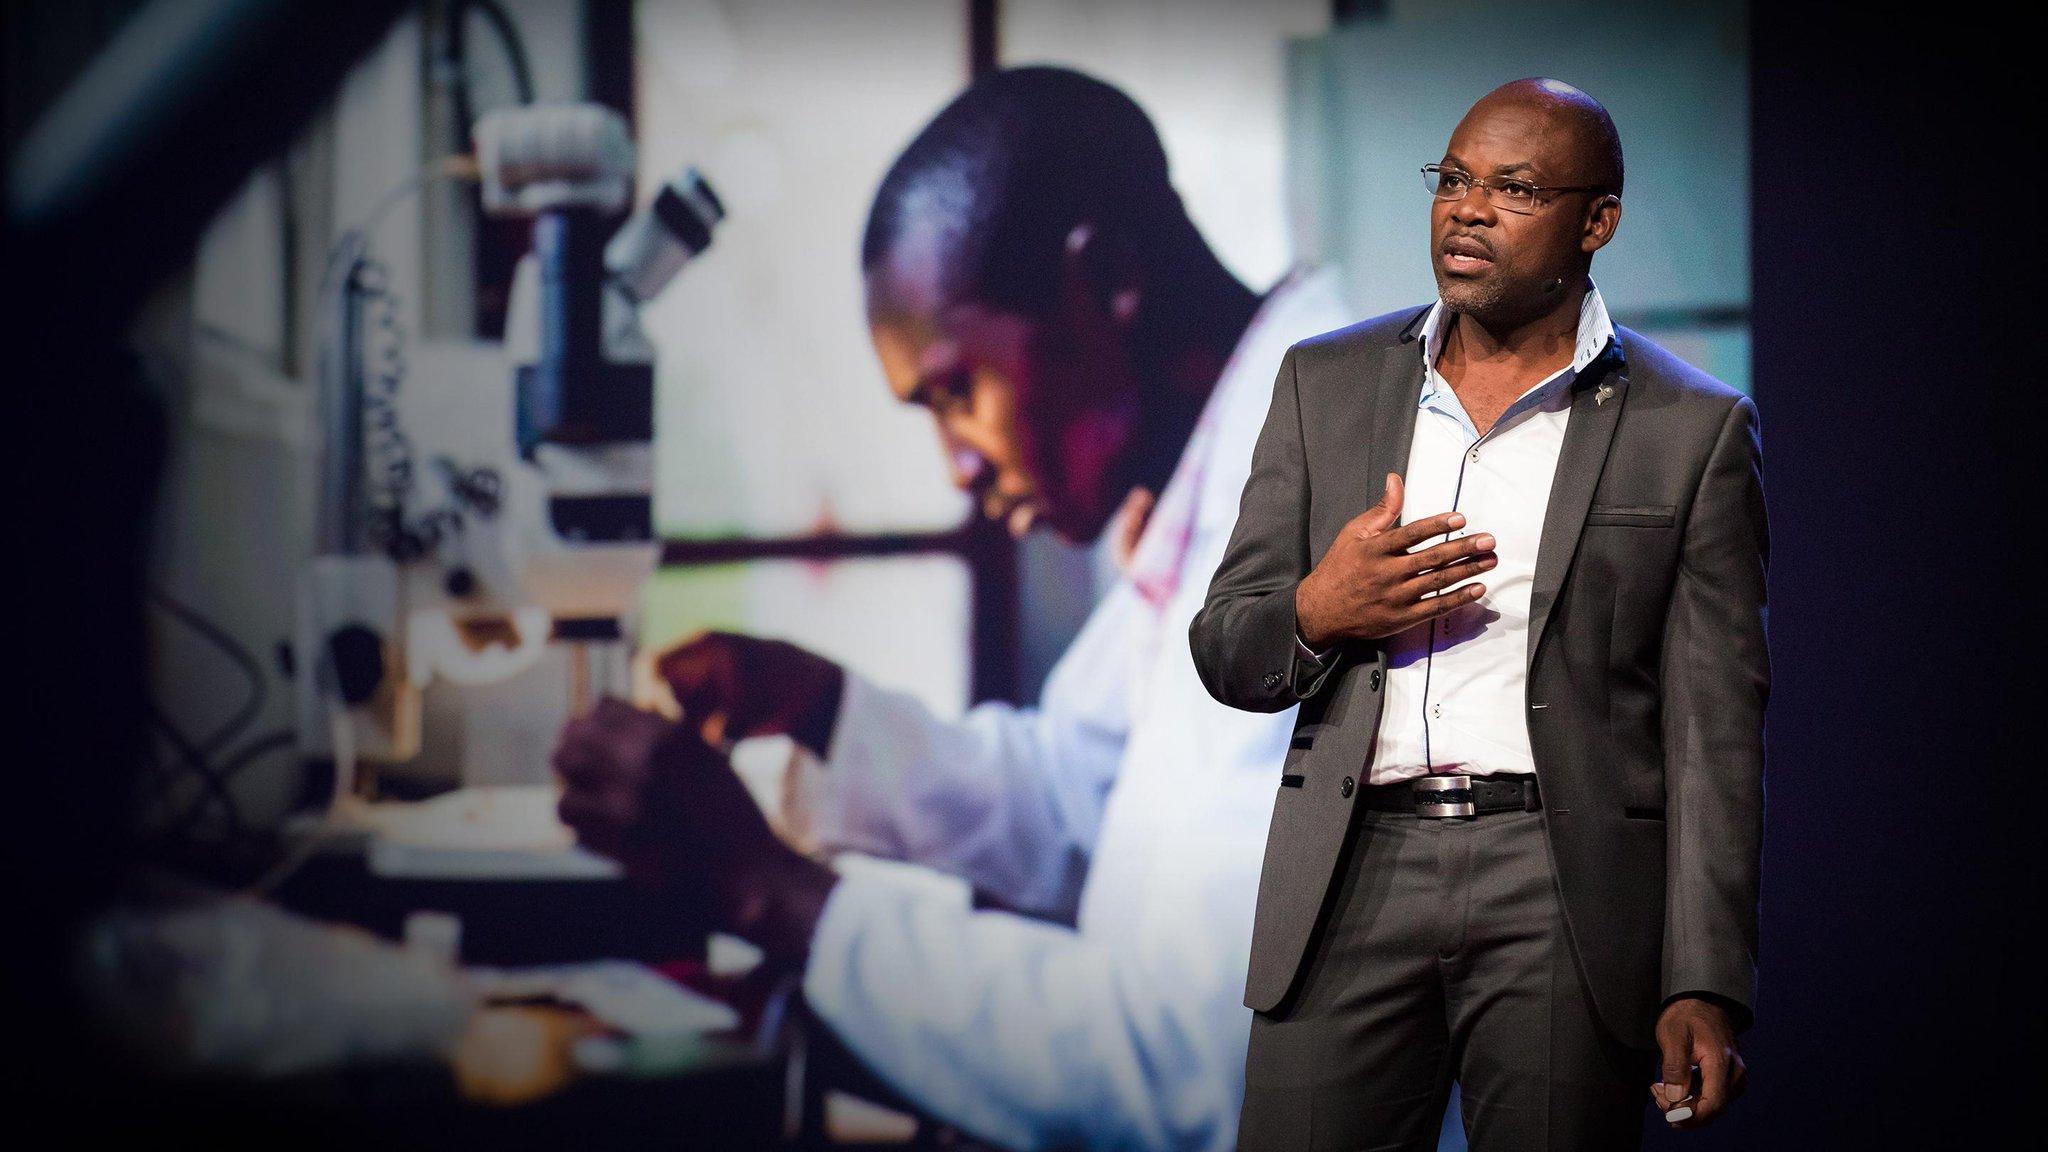 How we can stop Africa's scientific brain drain: https://t.co/KmCkw4LZSM @kynjabo https://t.co/hSixLYnSCJ